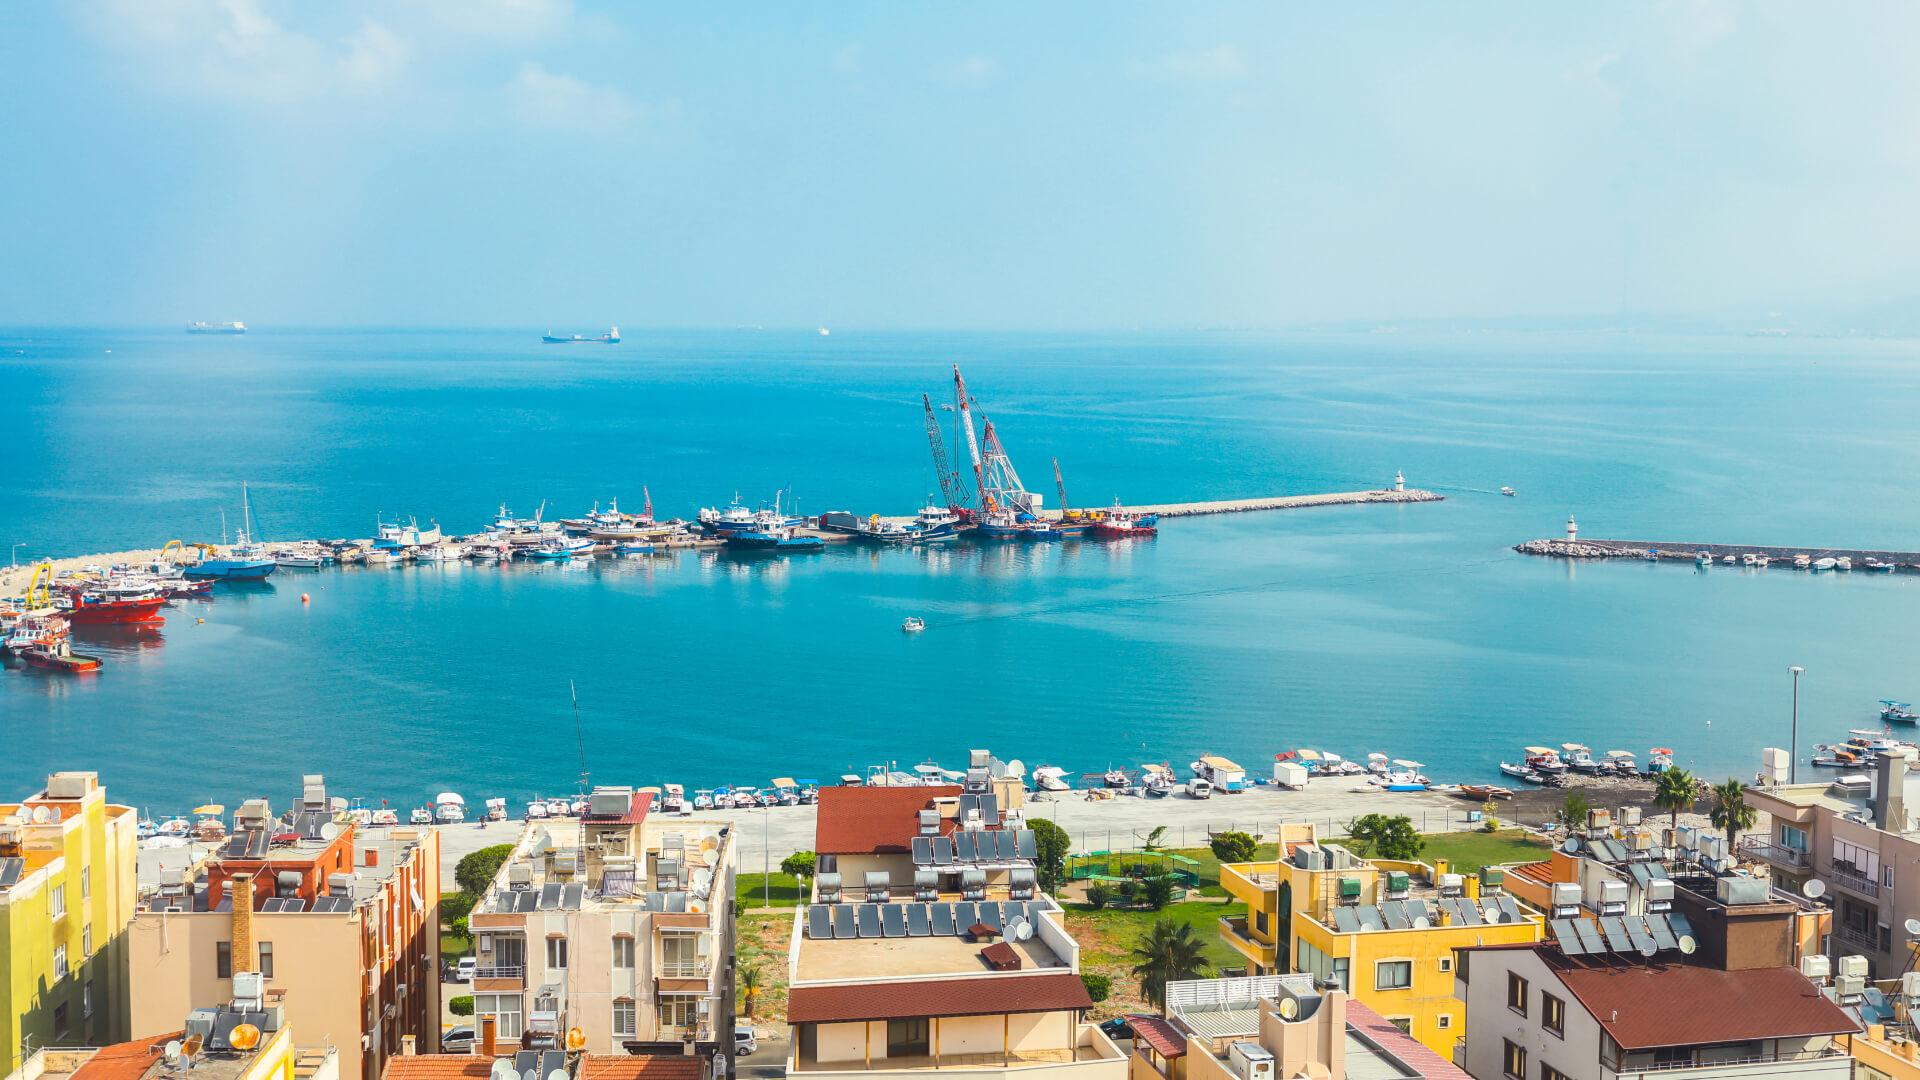 Hoşgörünün Hoş Şehri Antakya